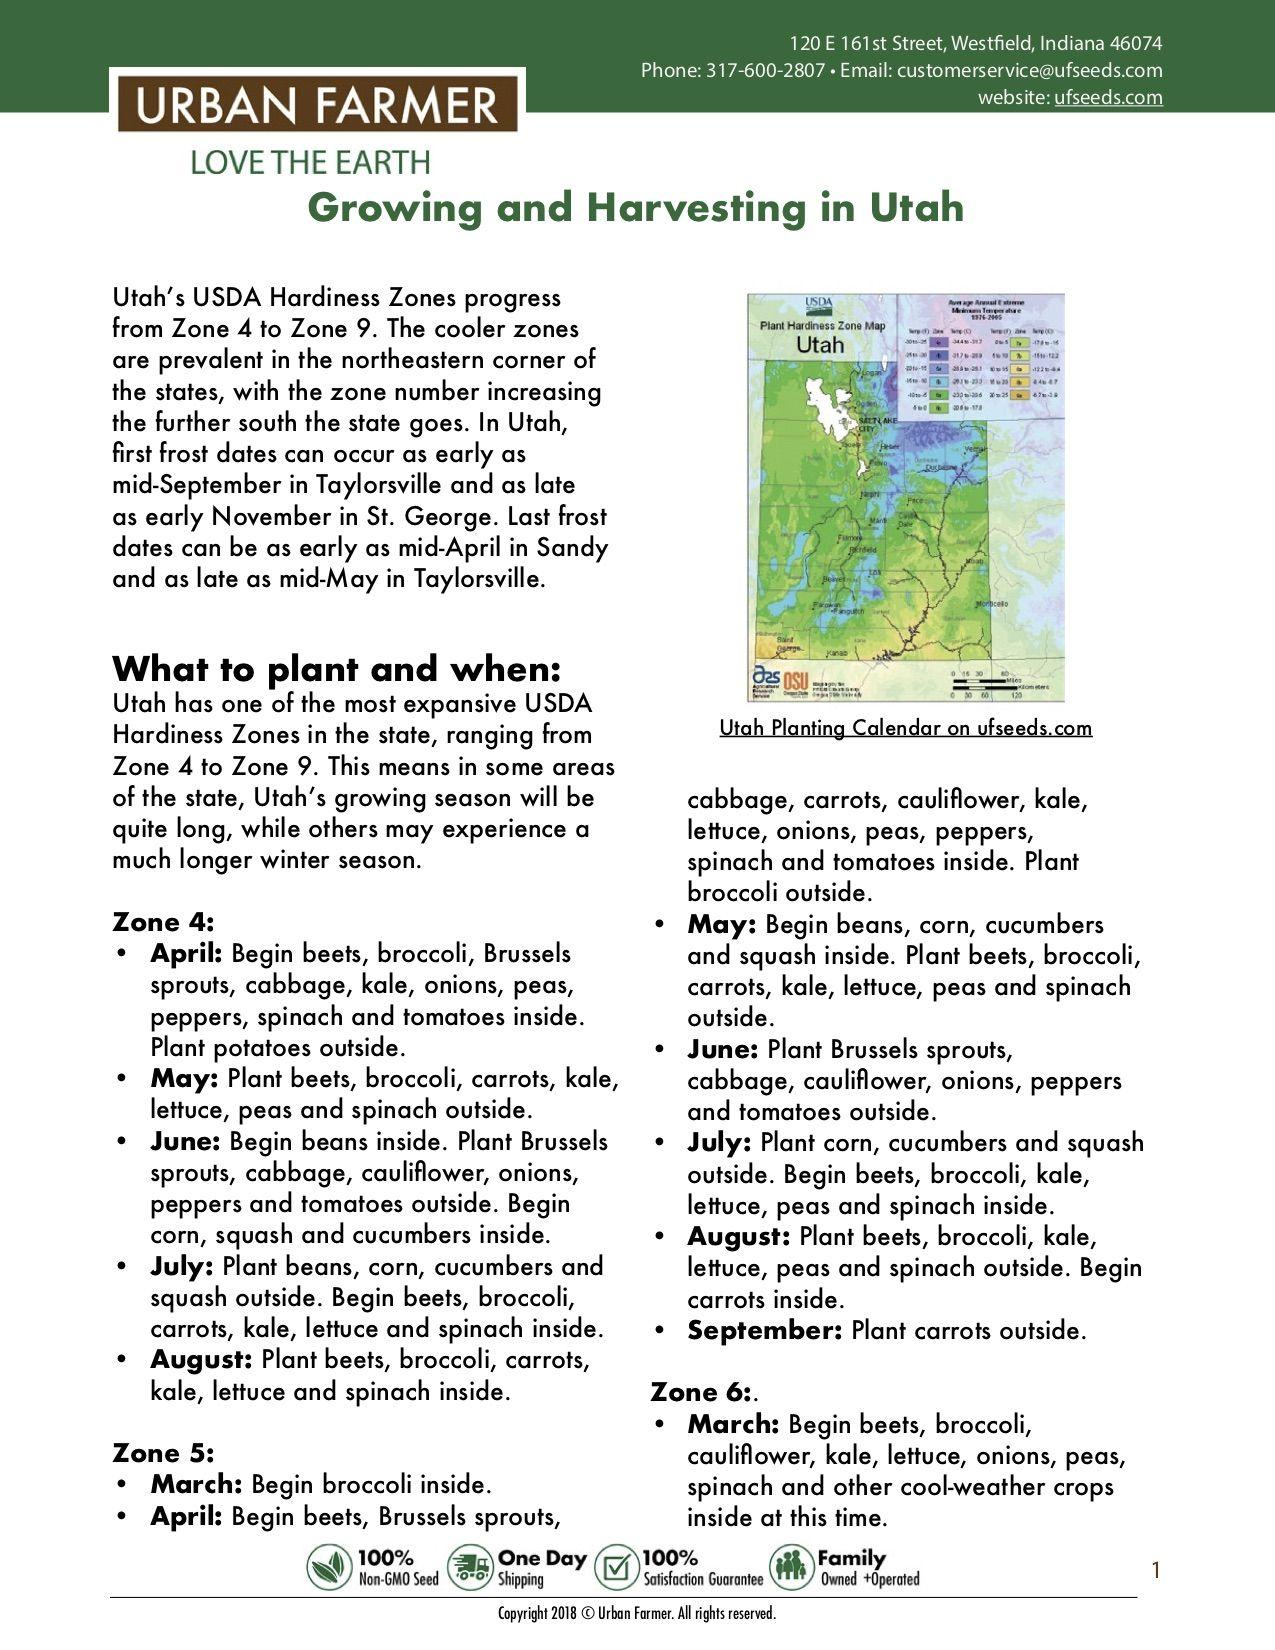 Utah Vegetable Planting Calendar